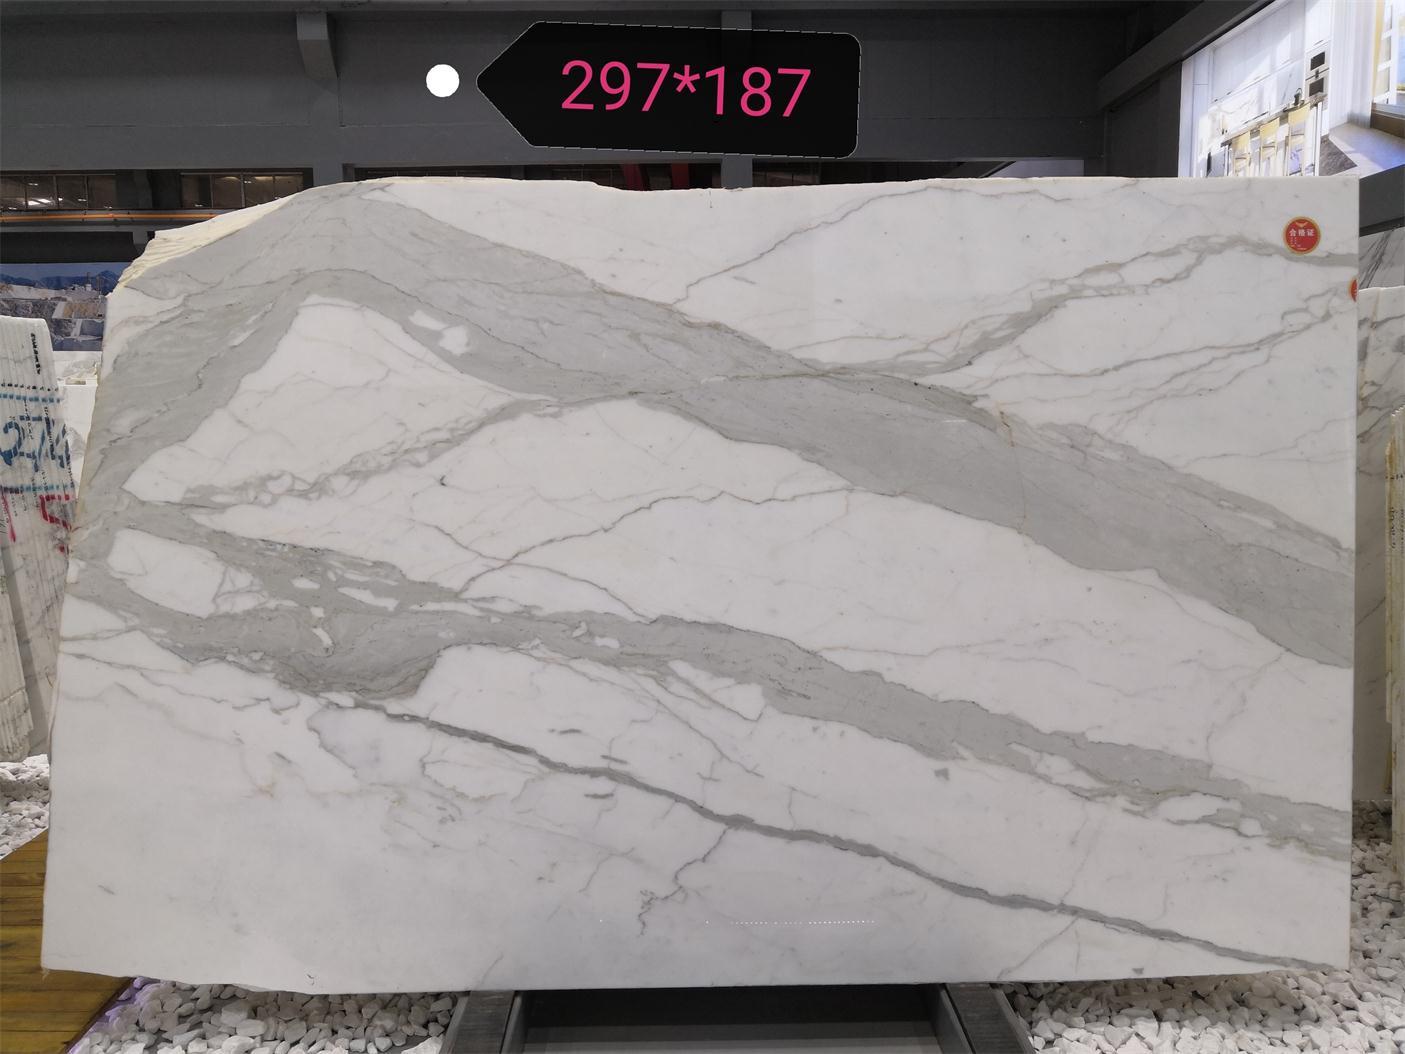 Calacatta White Slabs Polished Marble Slabs